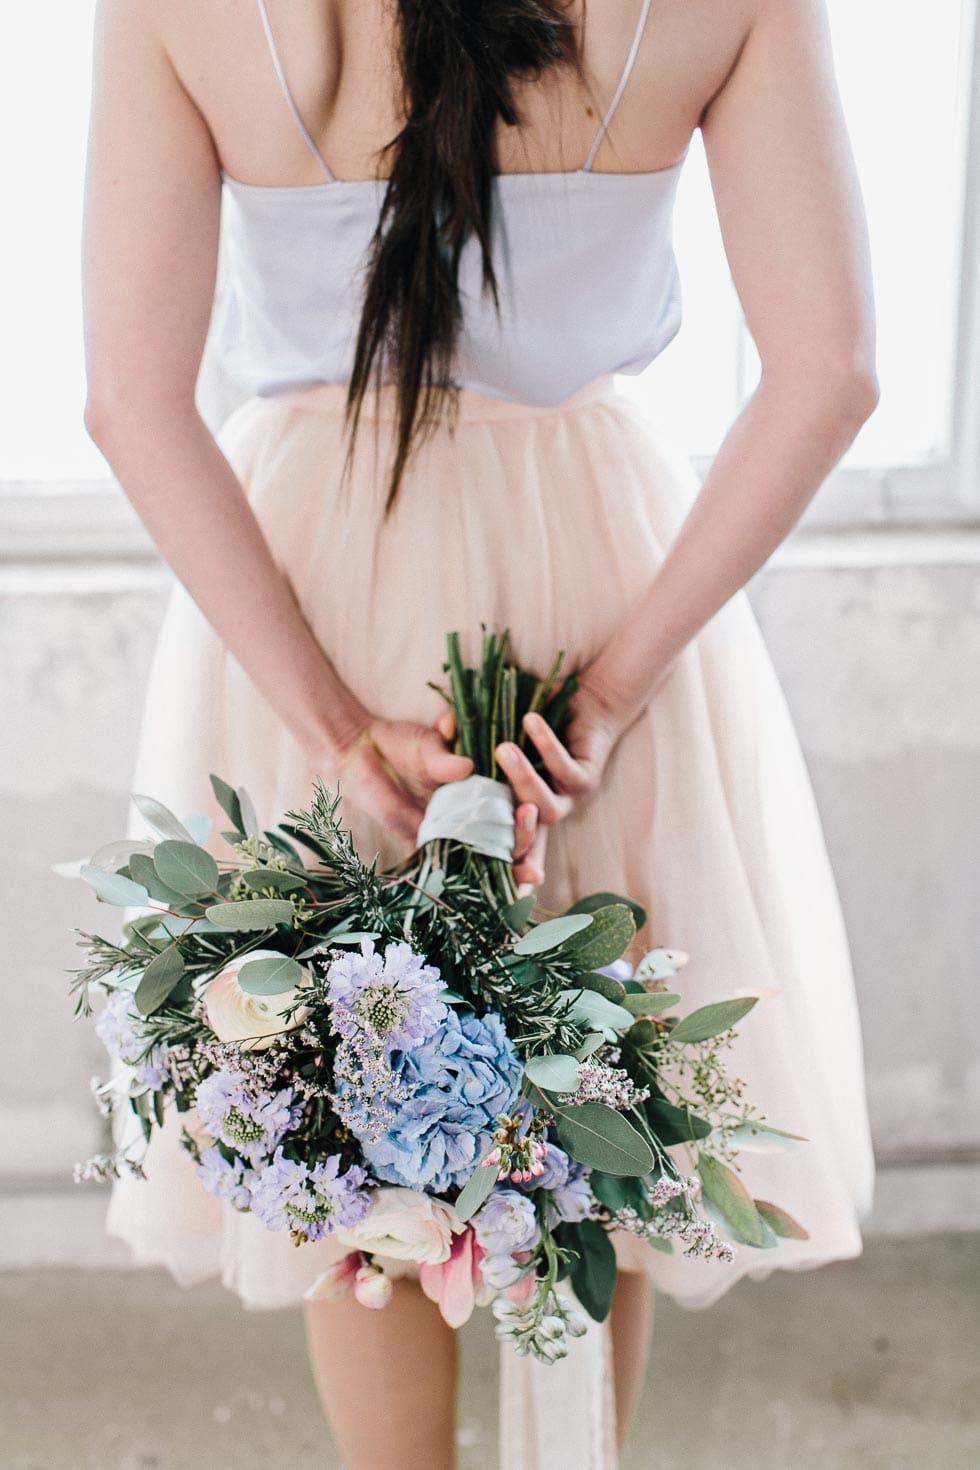 Brautstrauß Blau, Lila und Rosa